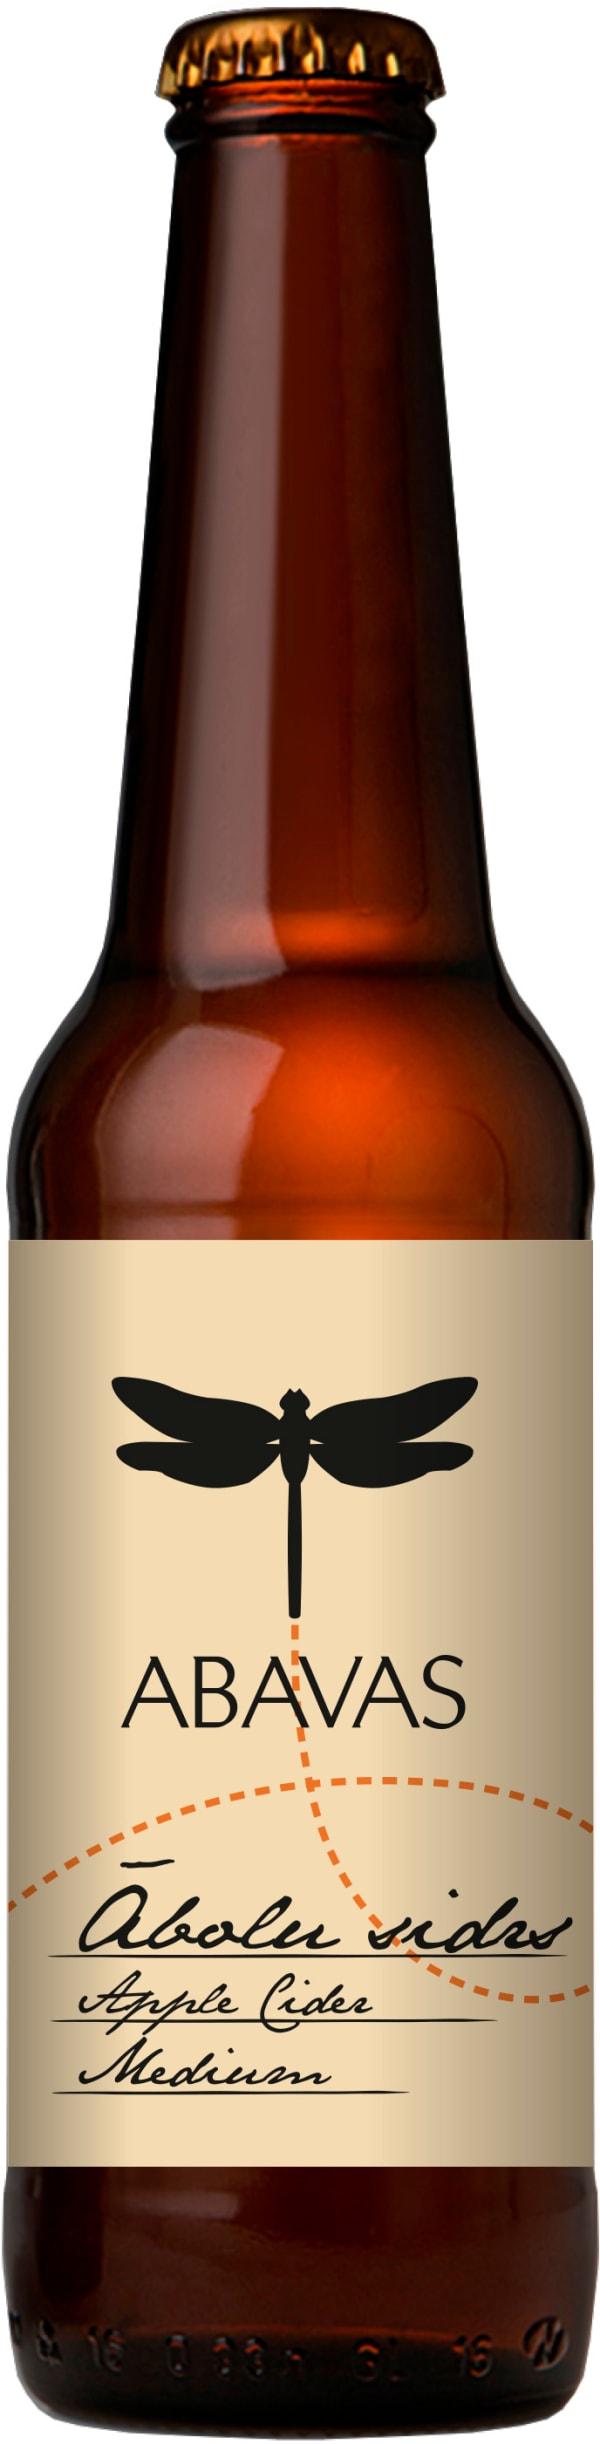 Abavas Abols Medium Dry Cider